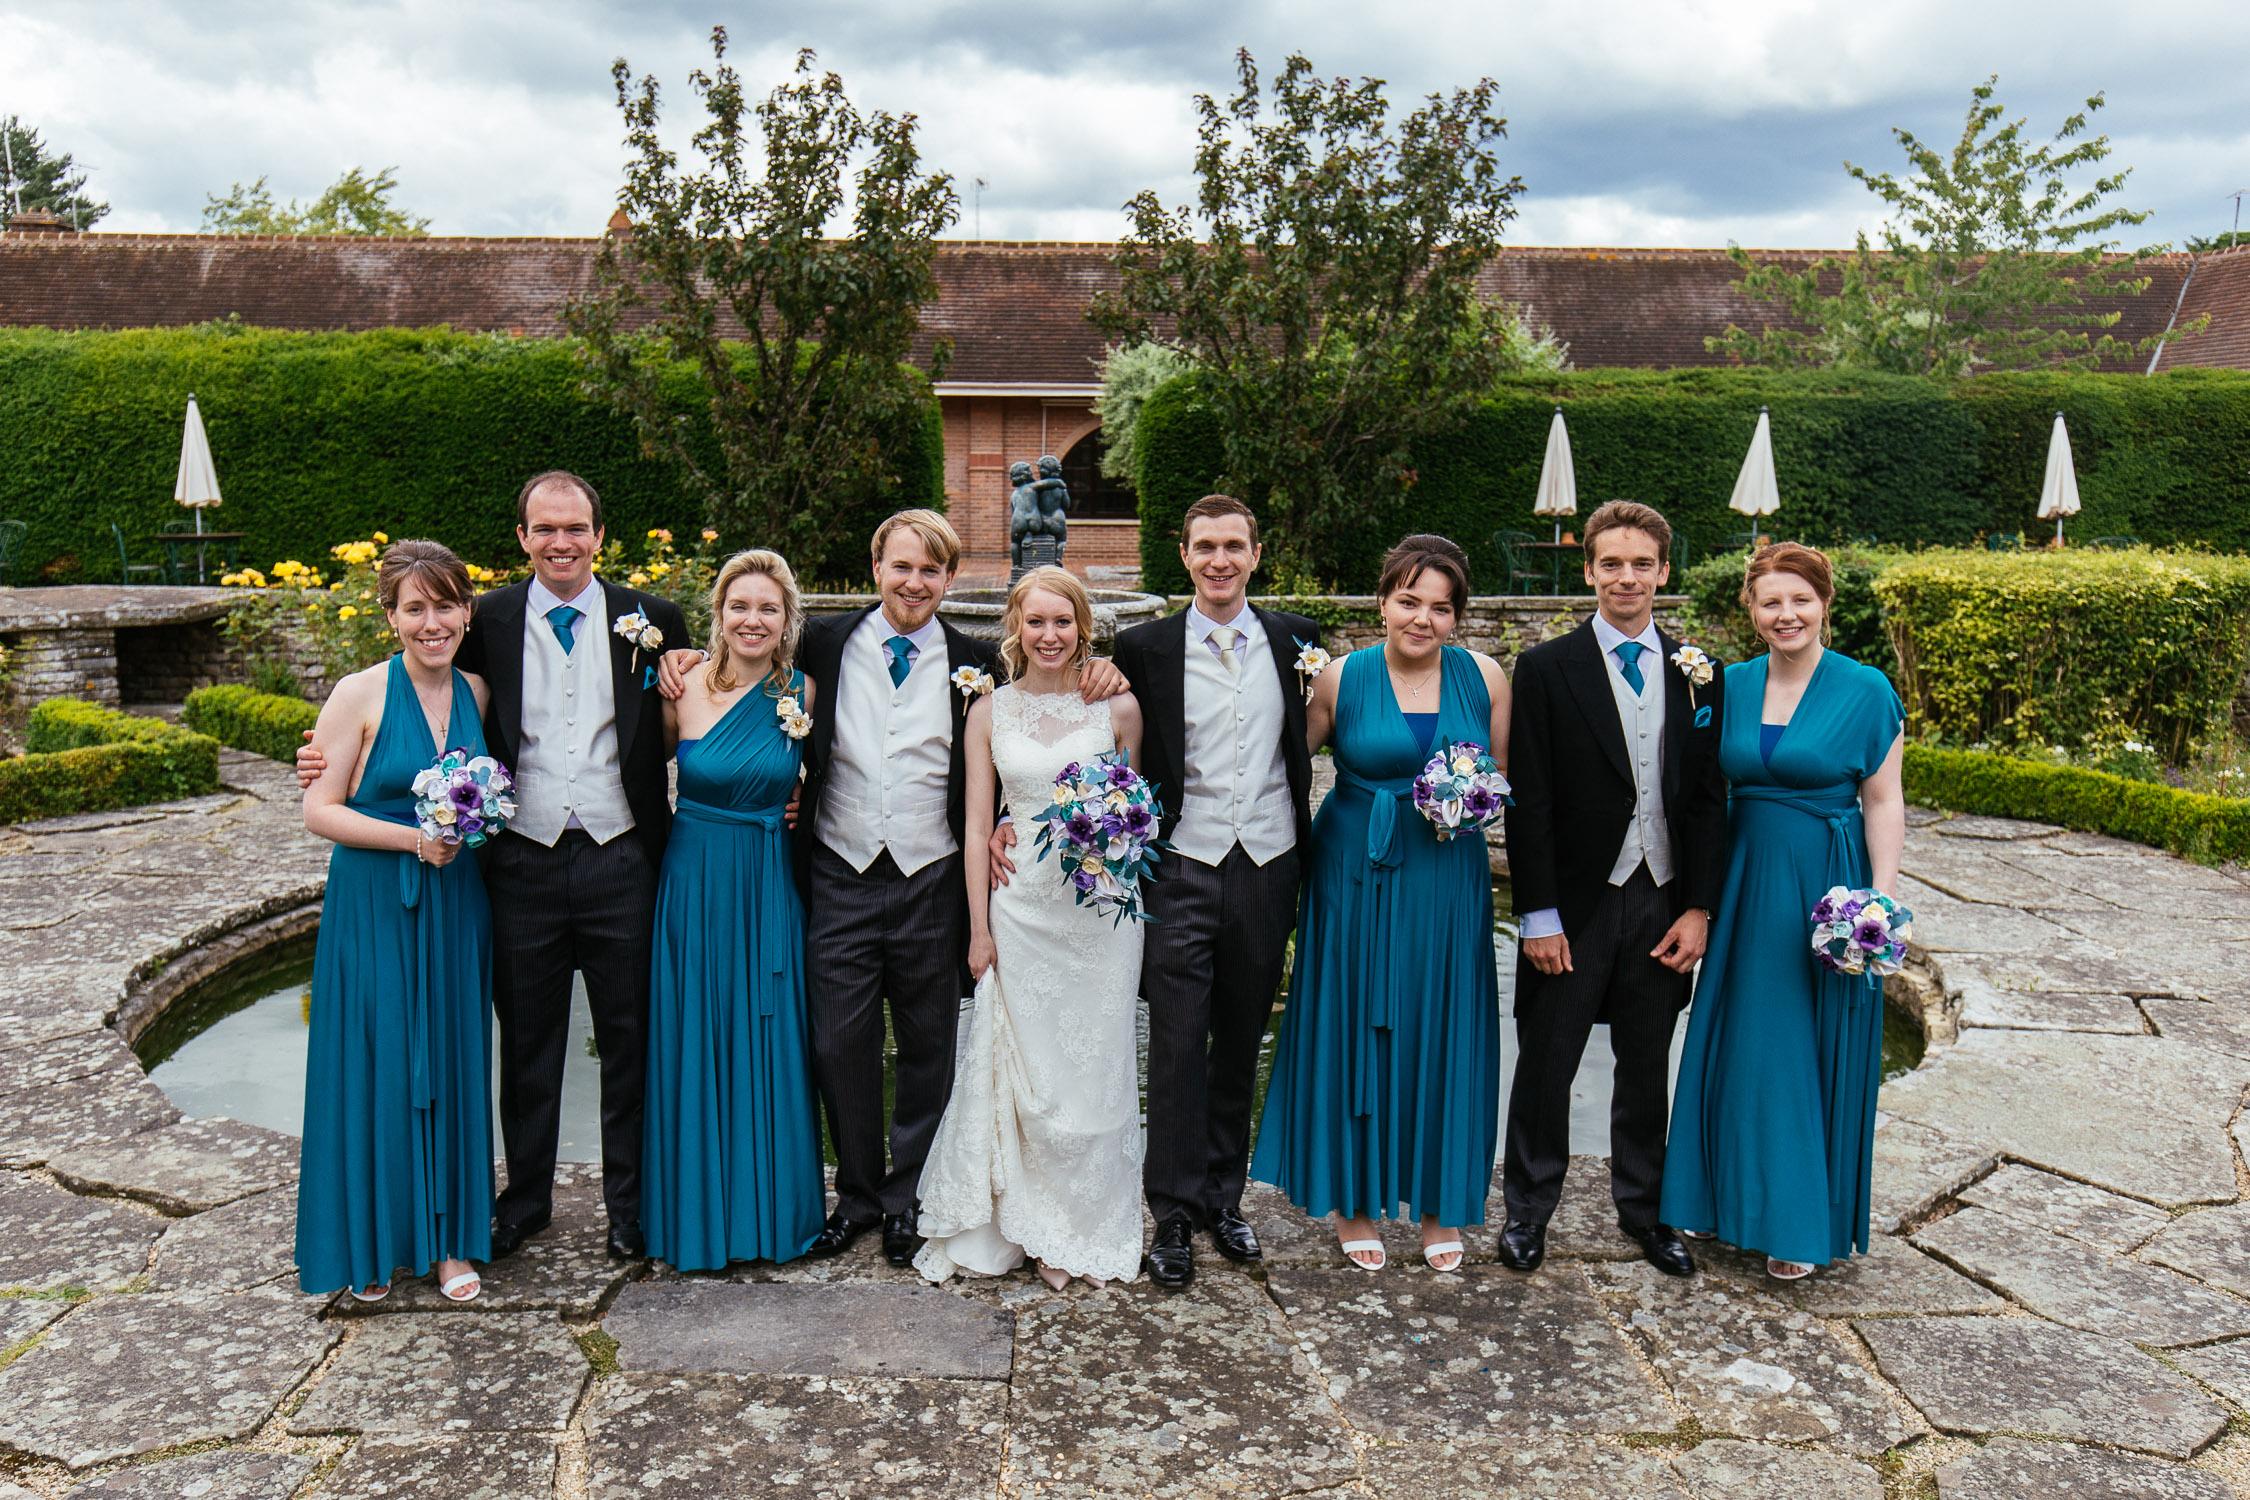 Lizi-and-Mark-Wedding-Highlights-57.jpg